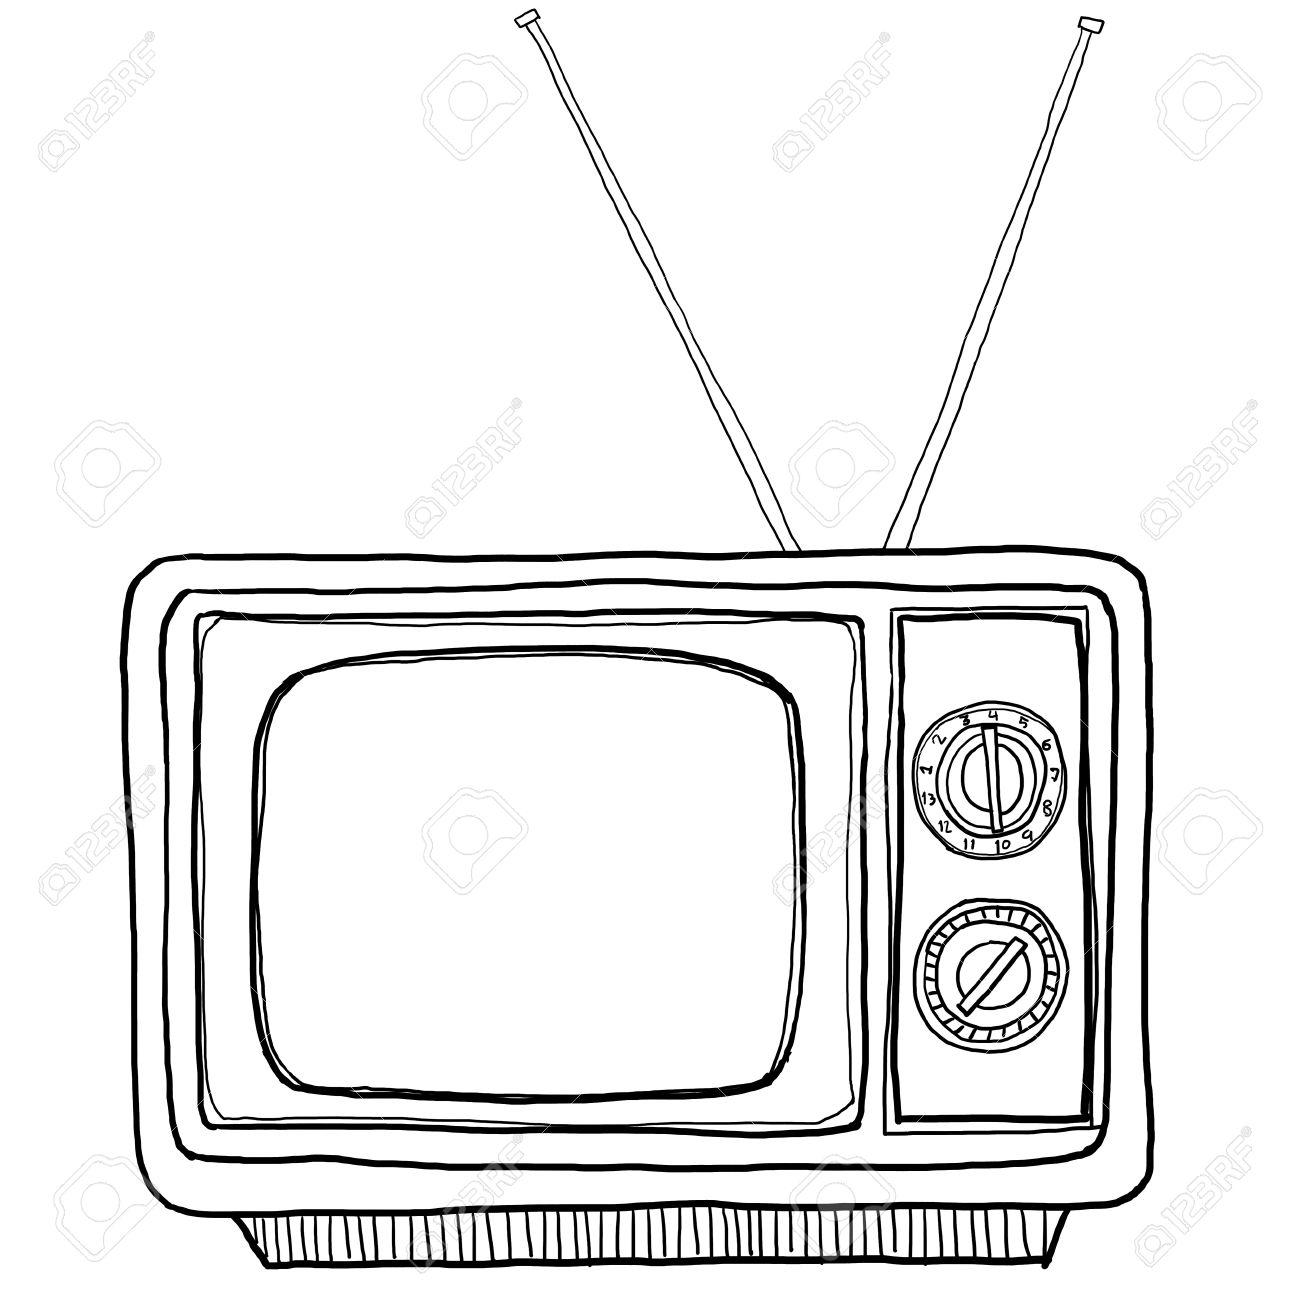 tv vintage line art - 15529211